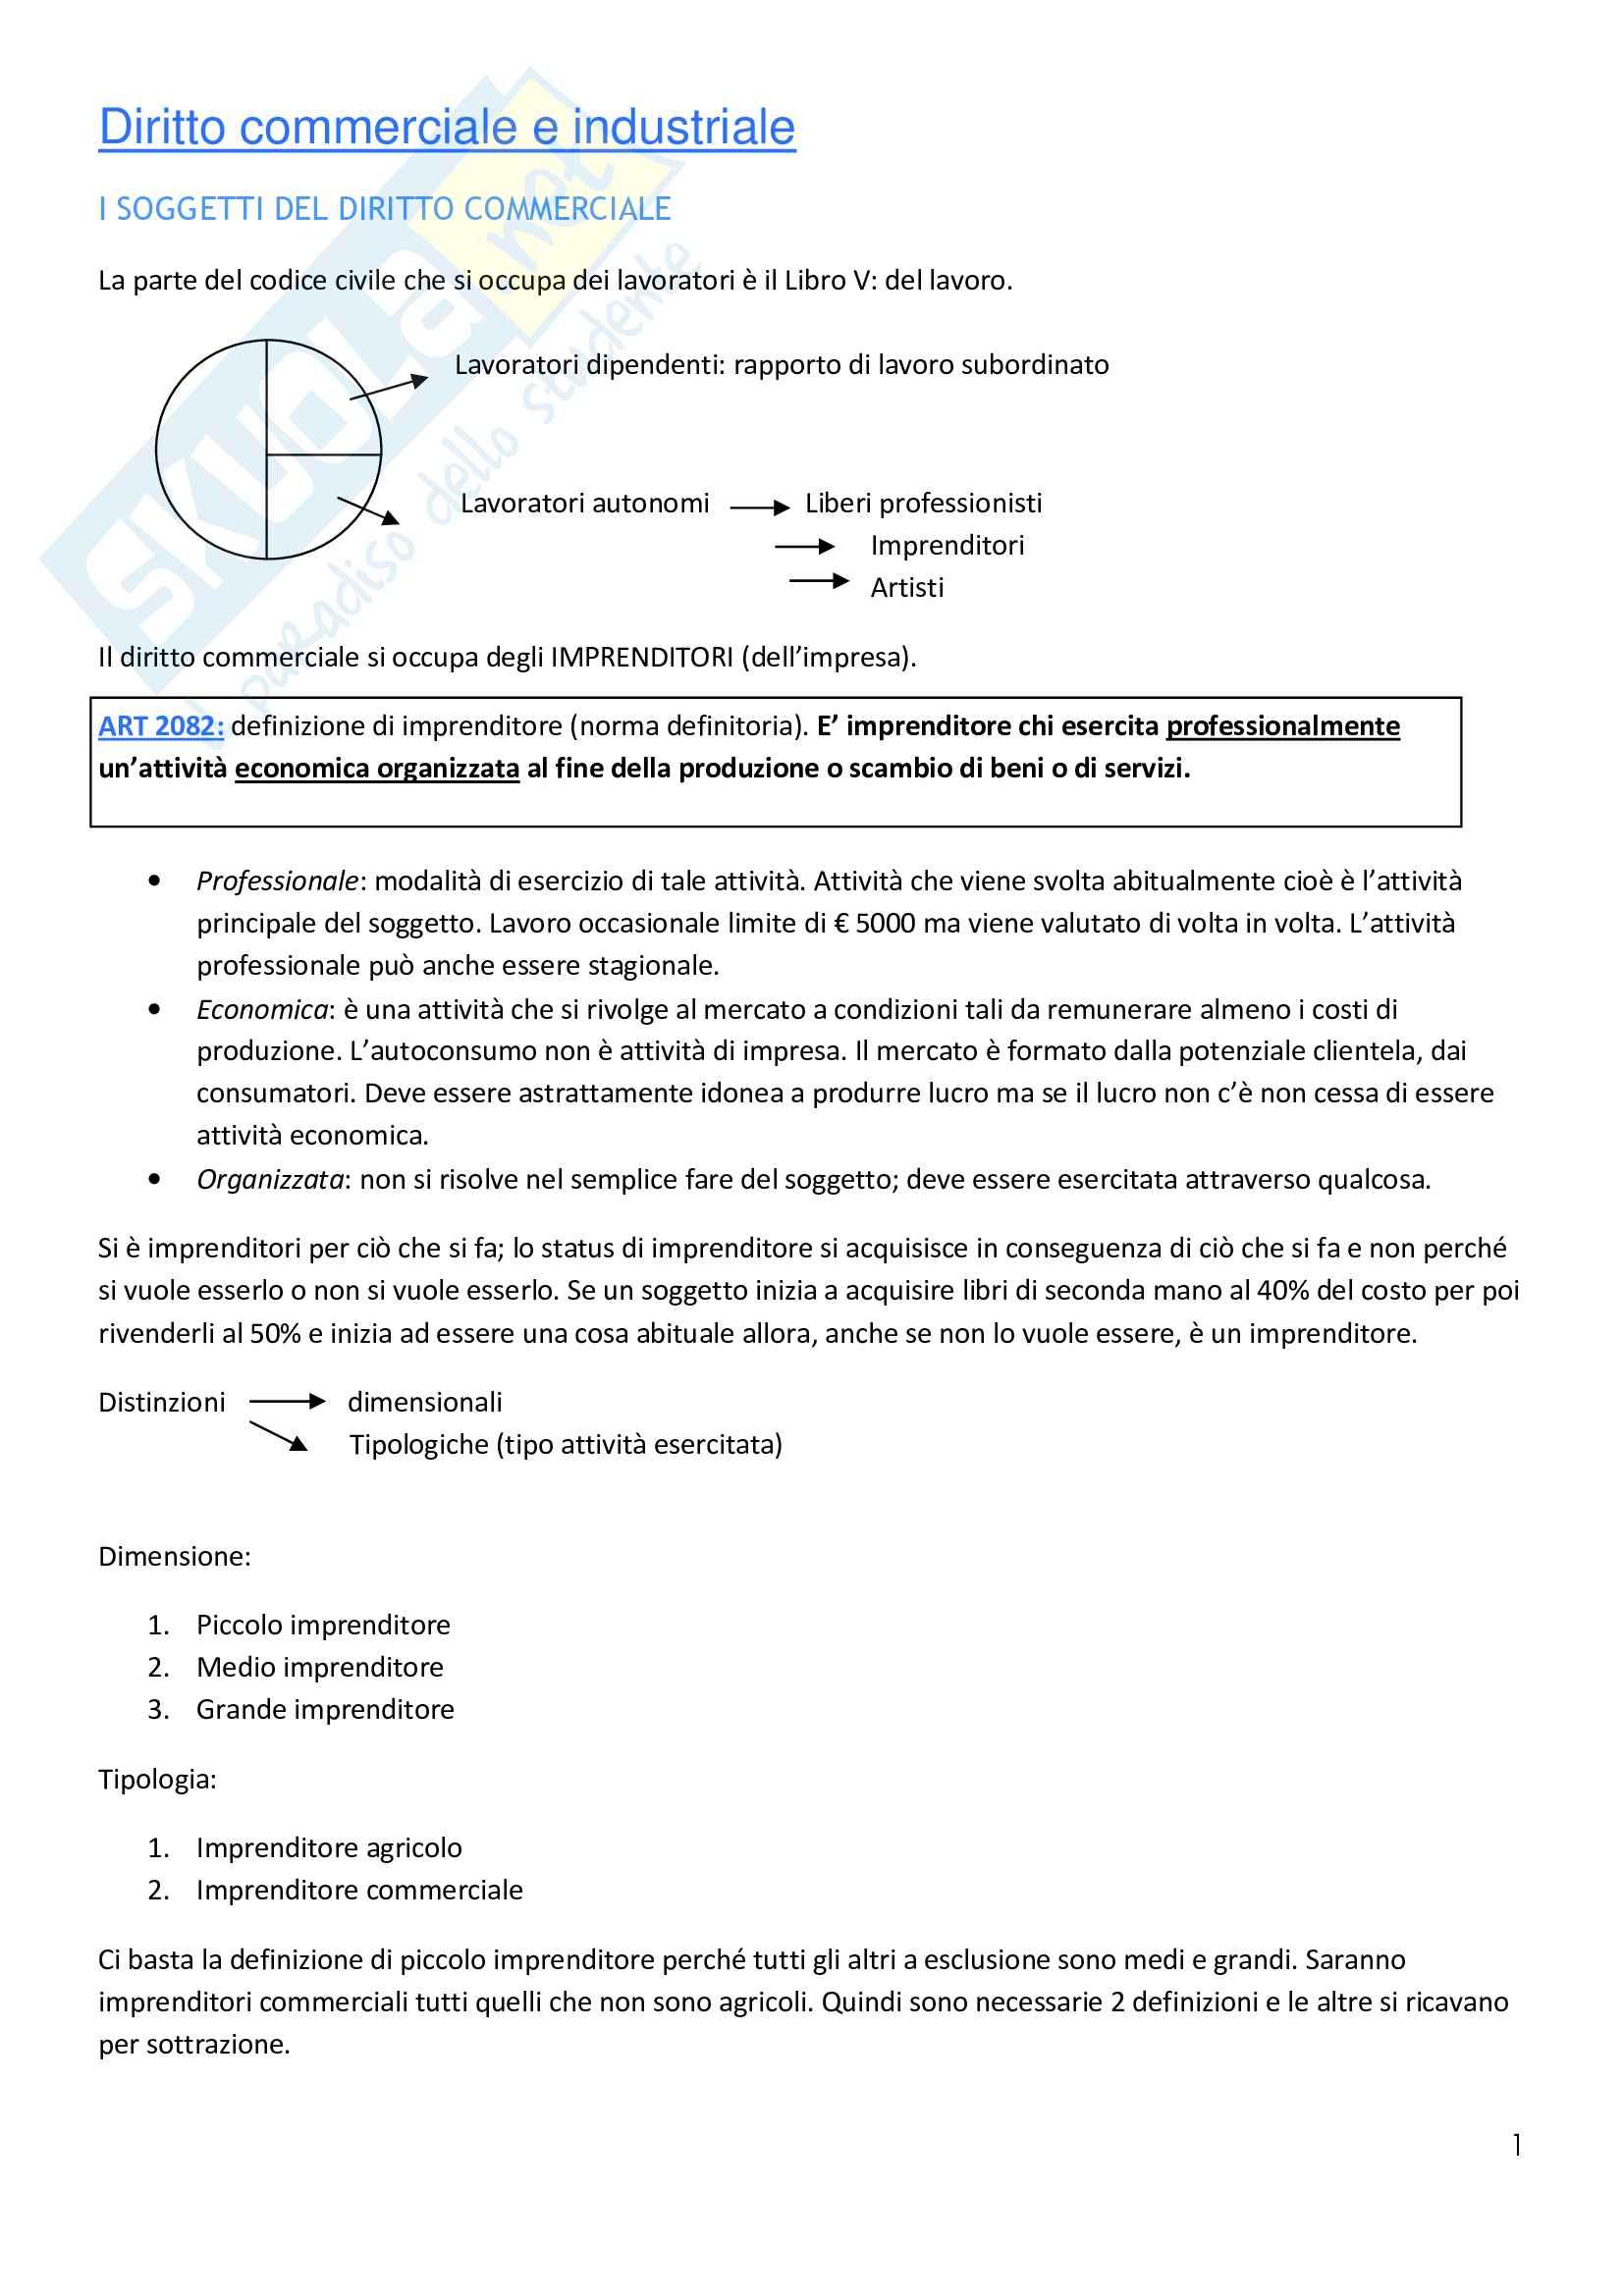 Diritto commerciale - Appunti Pag. 1